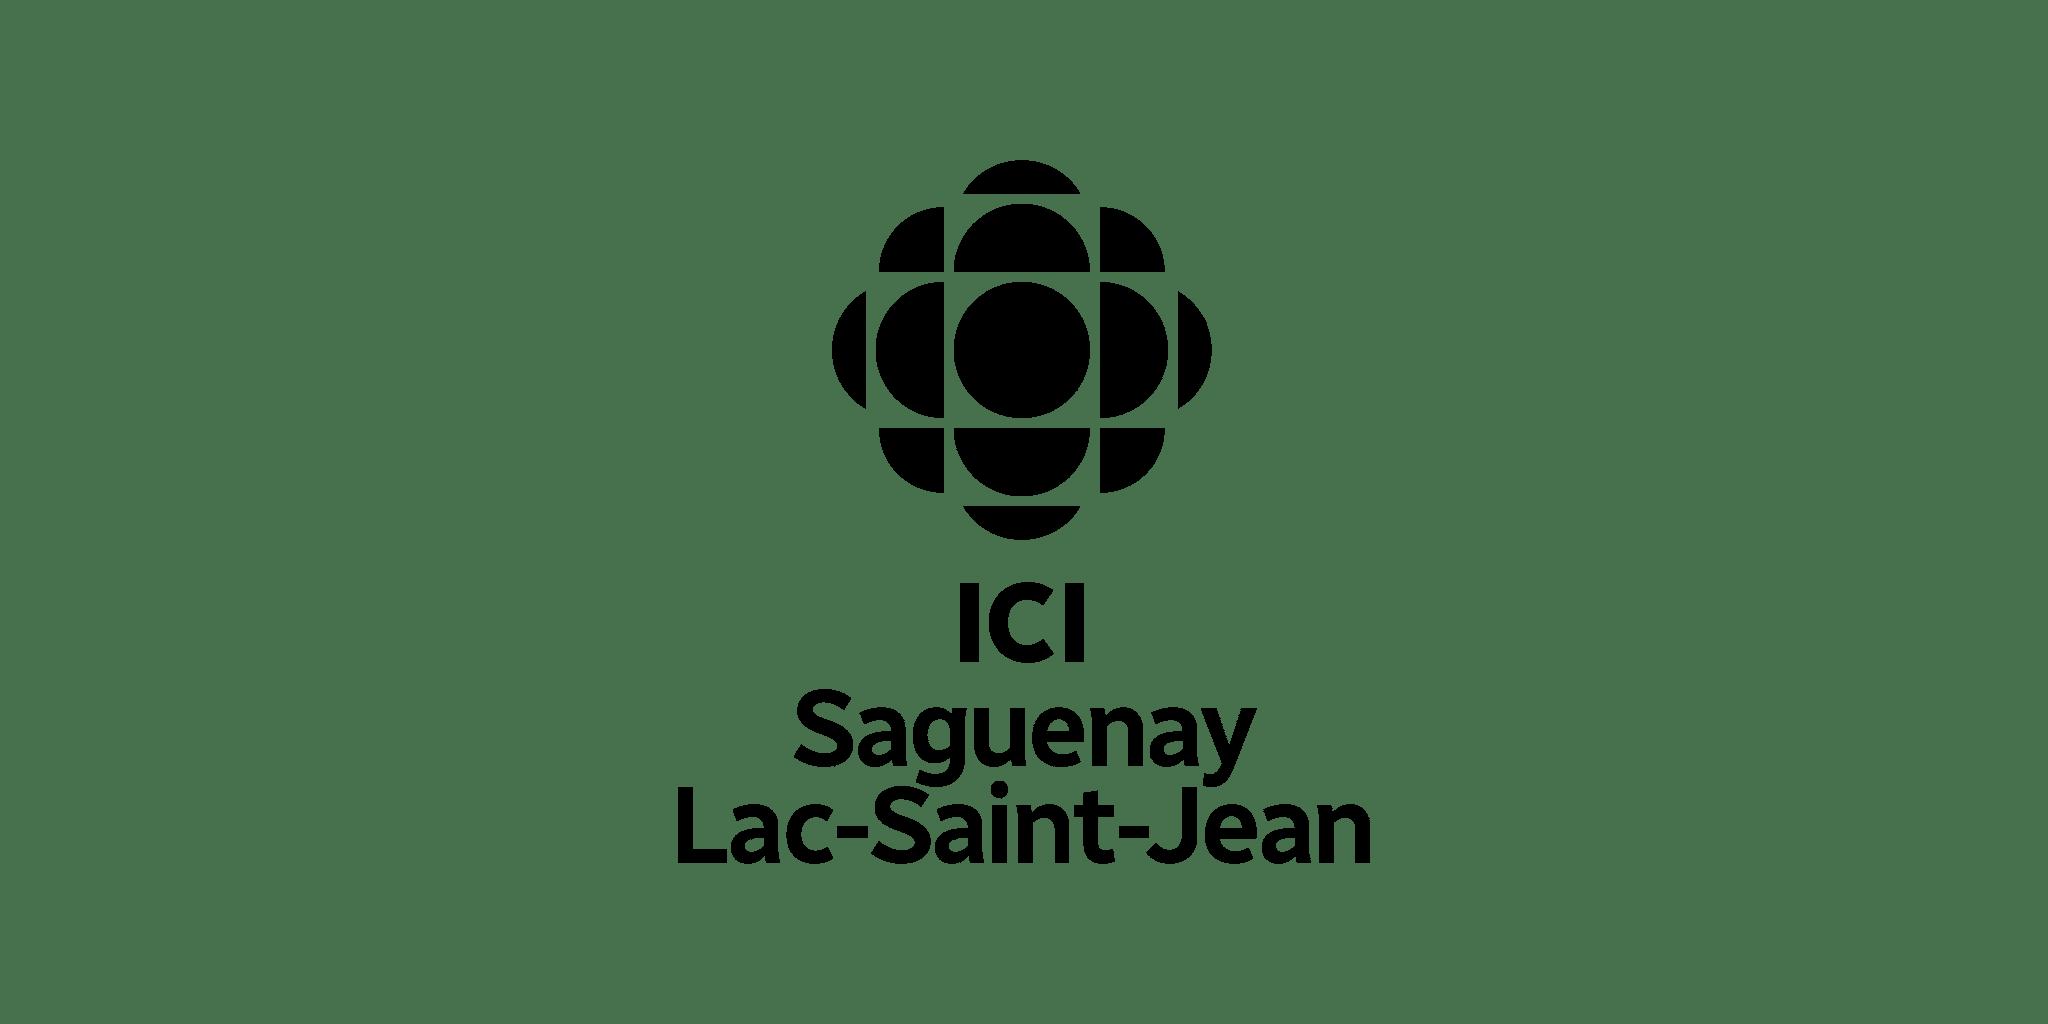 ICI Saguenay–Lac-Saint-Jean